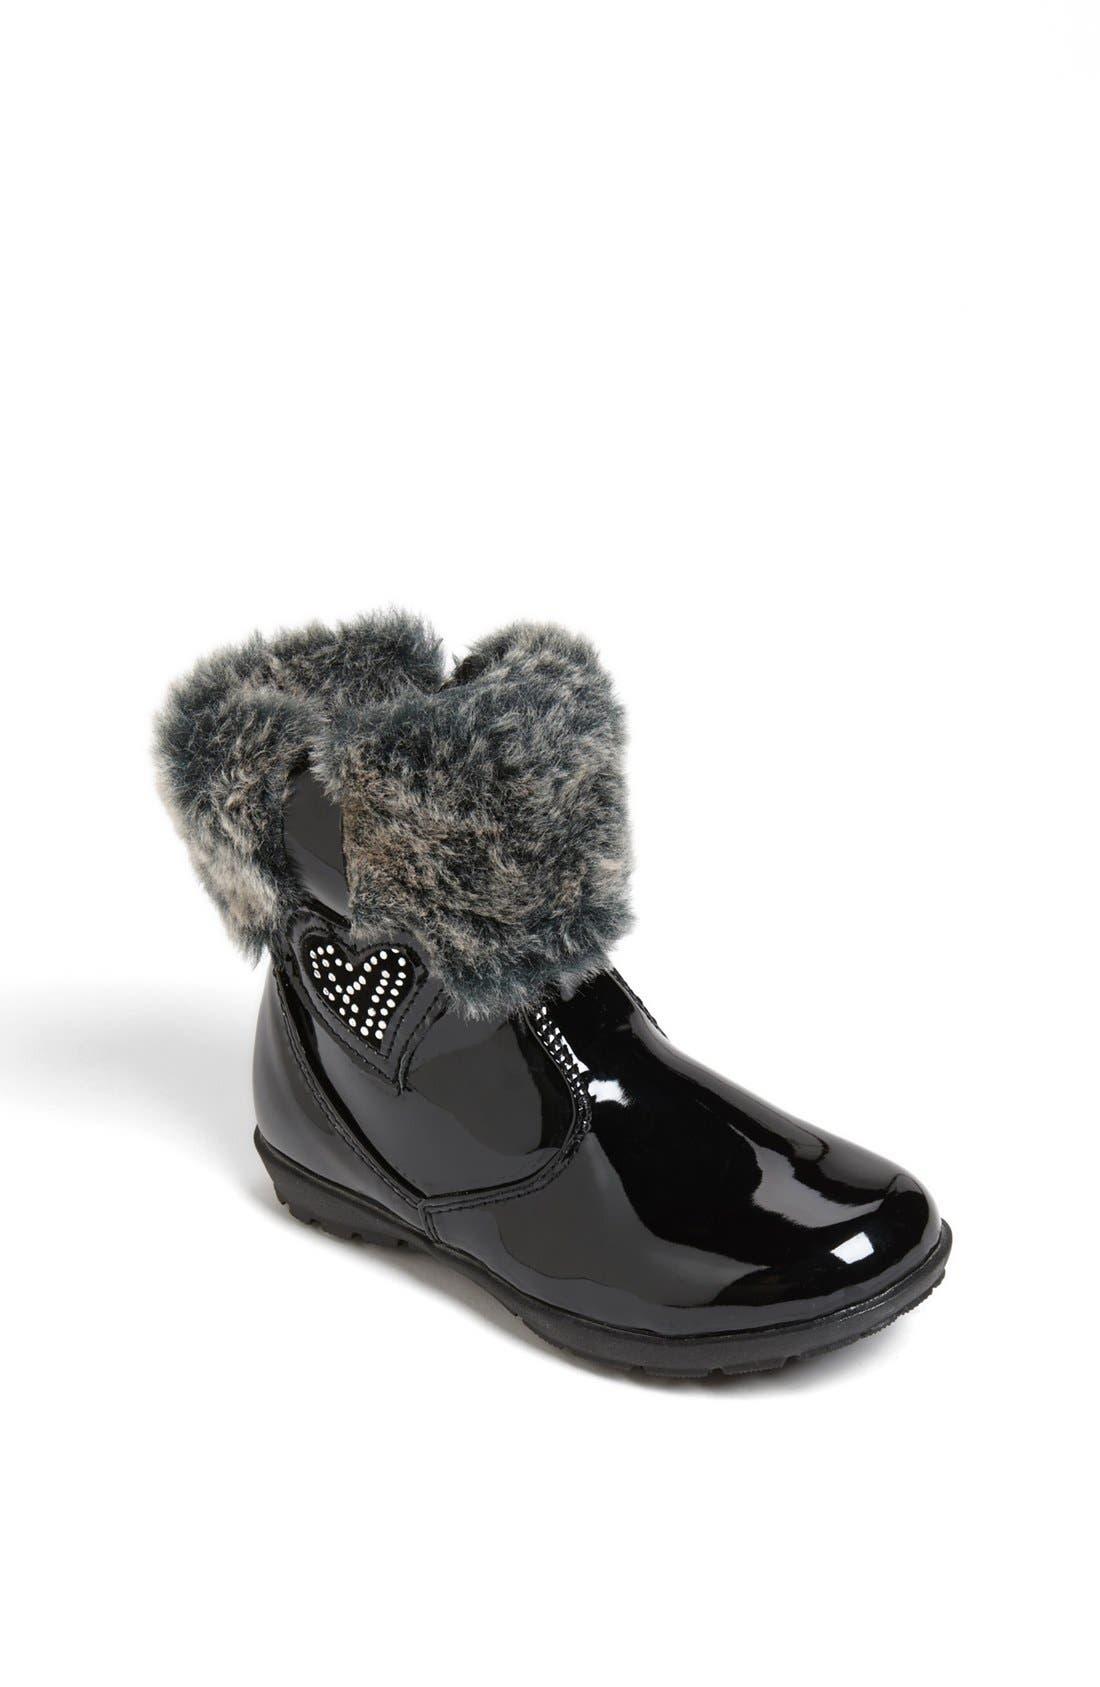 Alternate Image 1 Selected - kensie girl Faux Fur Trim Boot (Walker & Toddler)